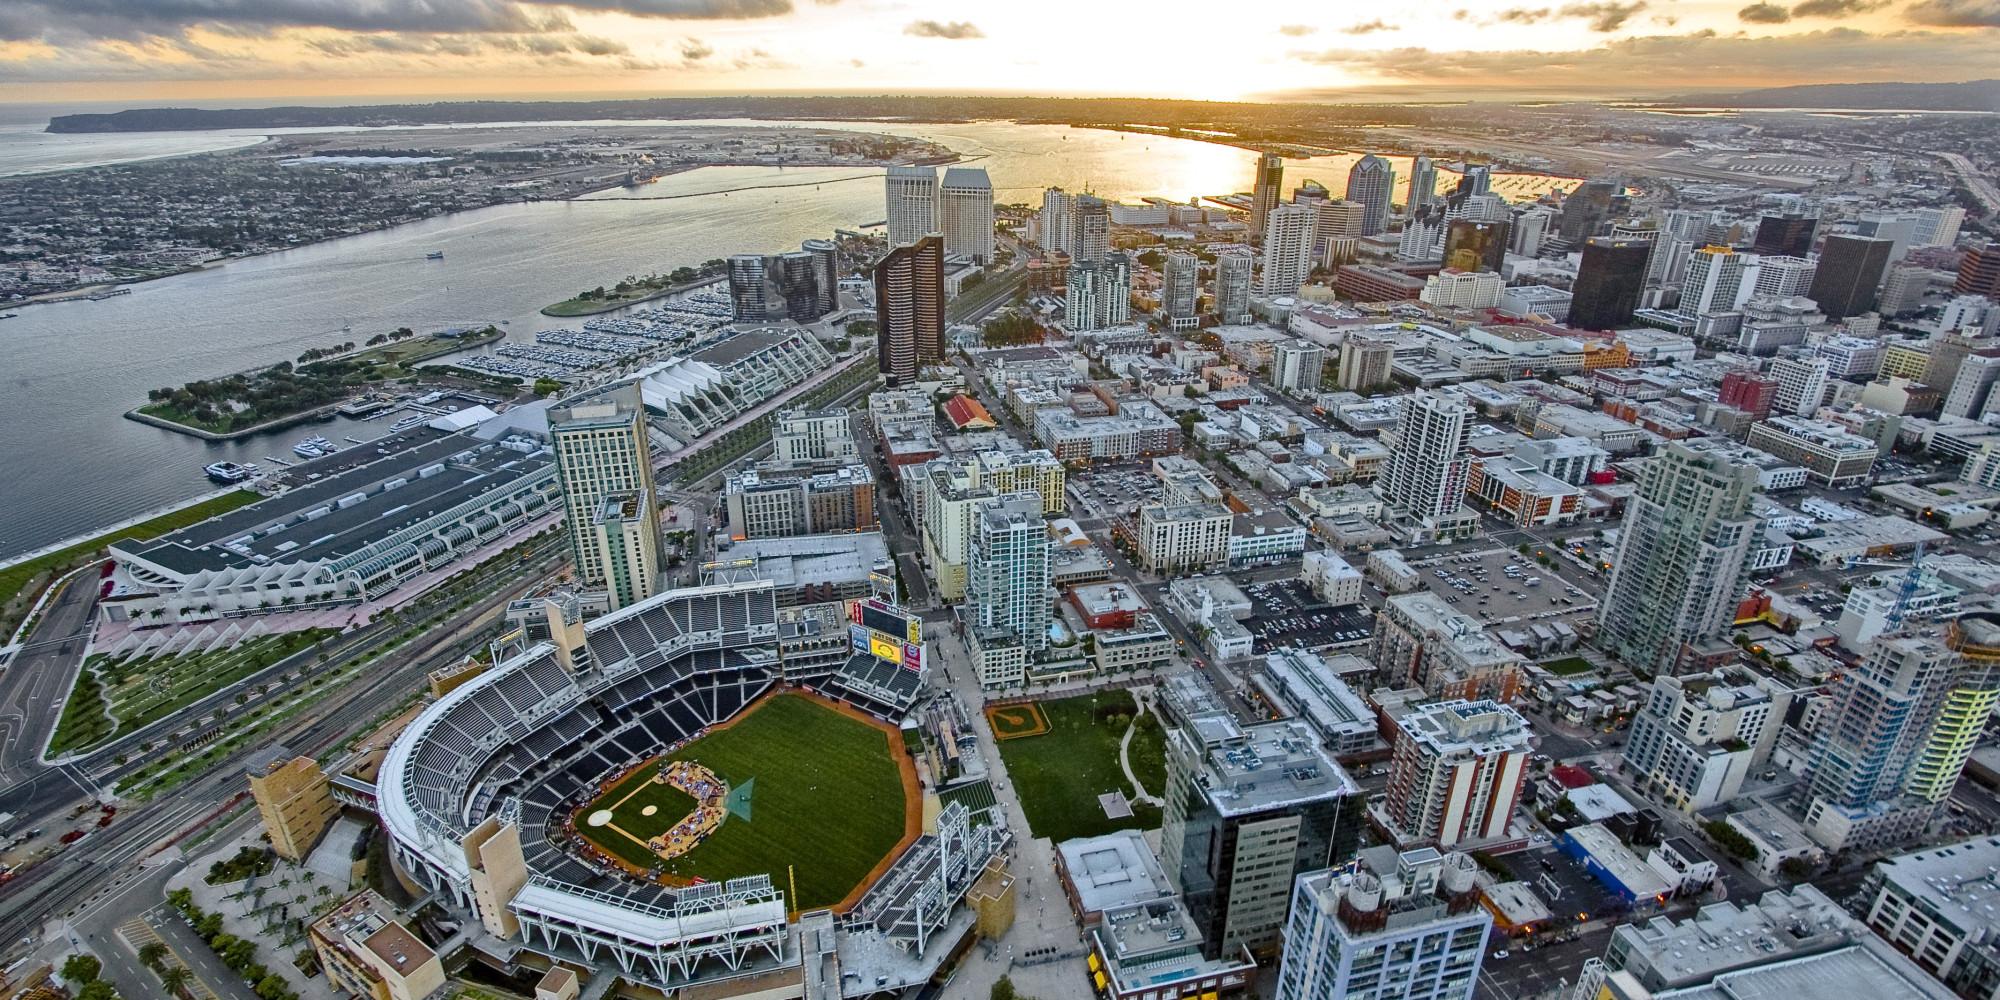 san diego aerial photo padres baseball ballpark